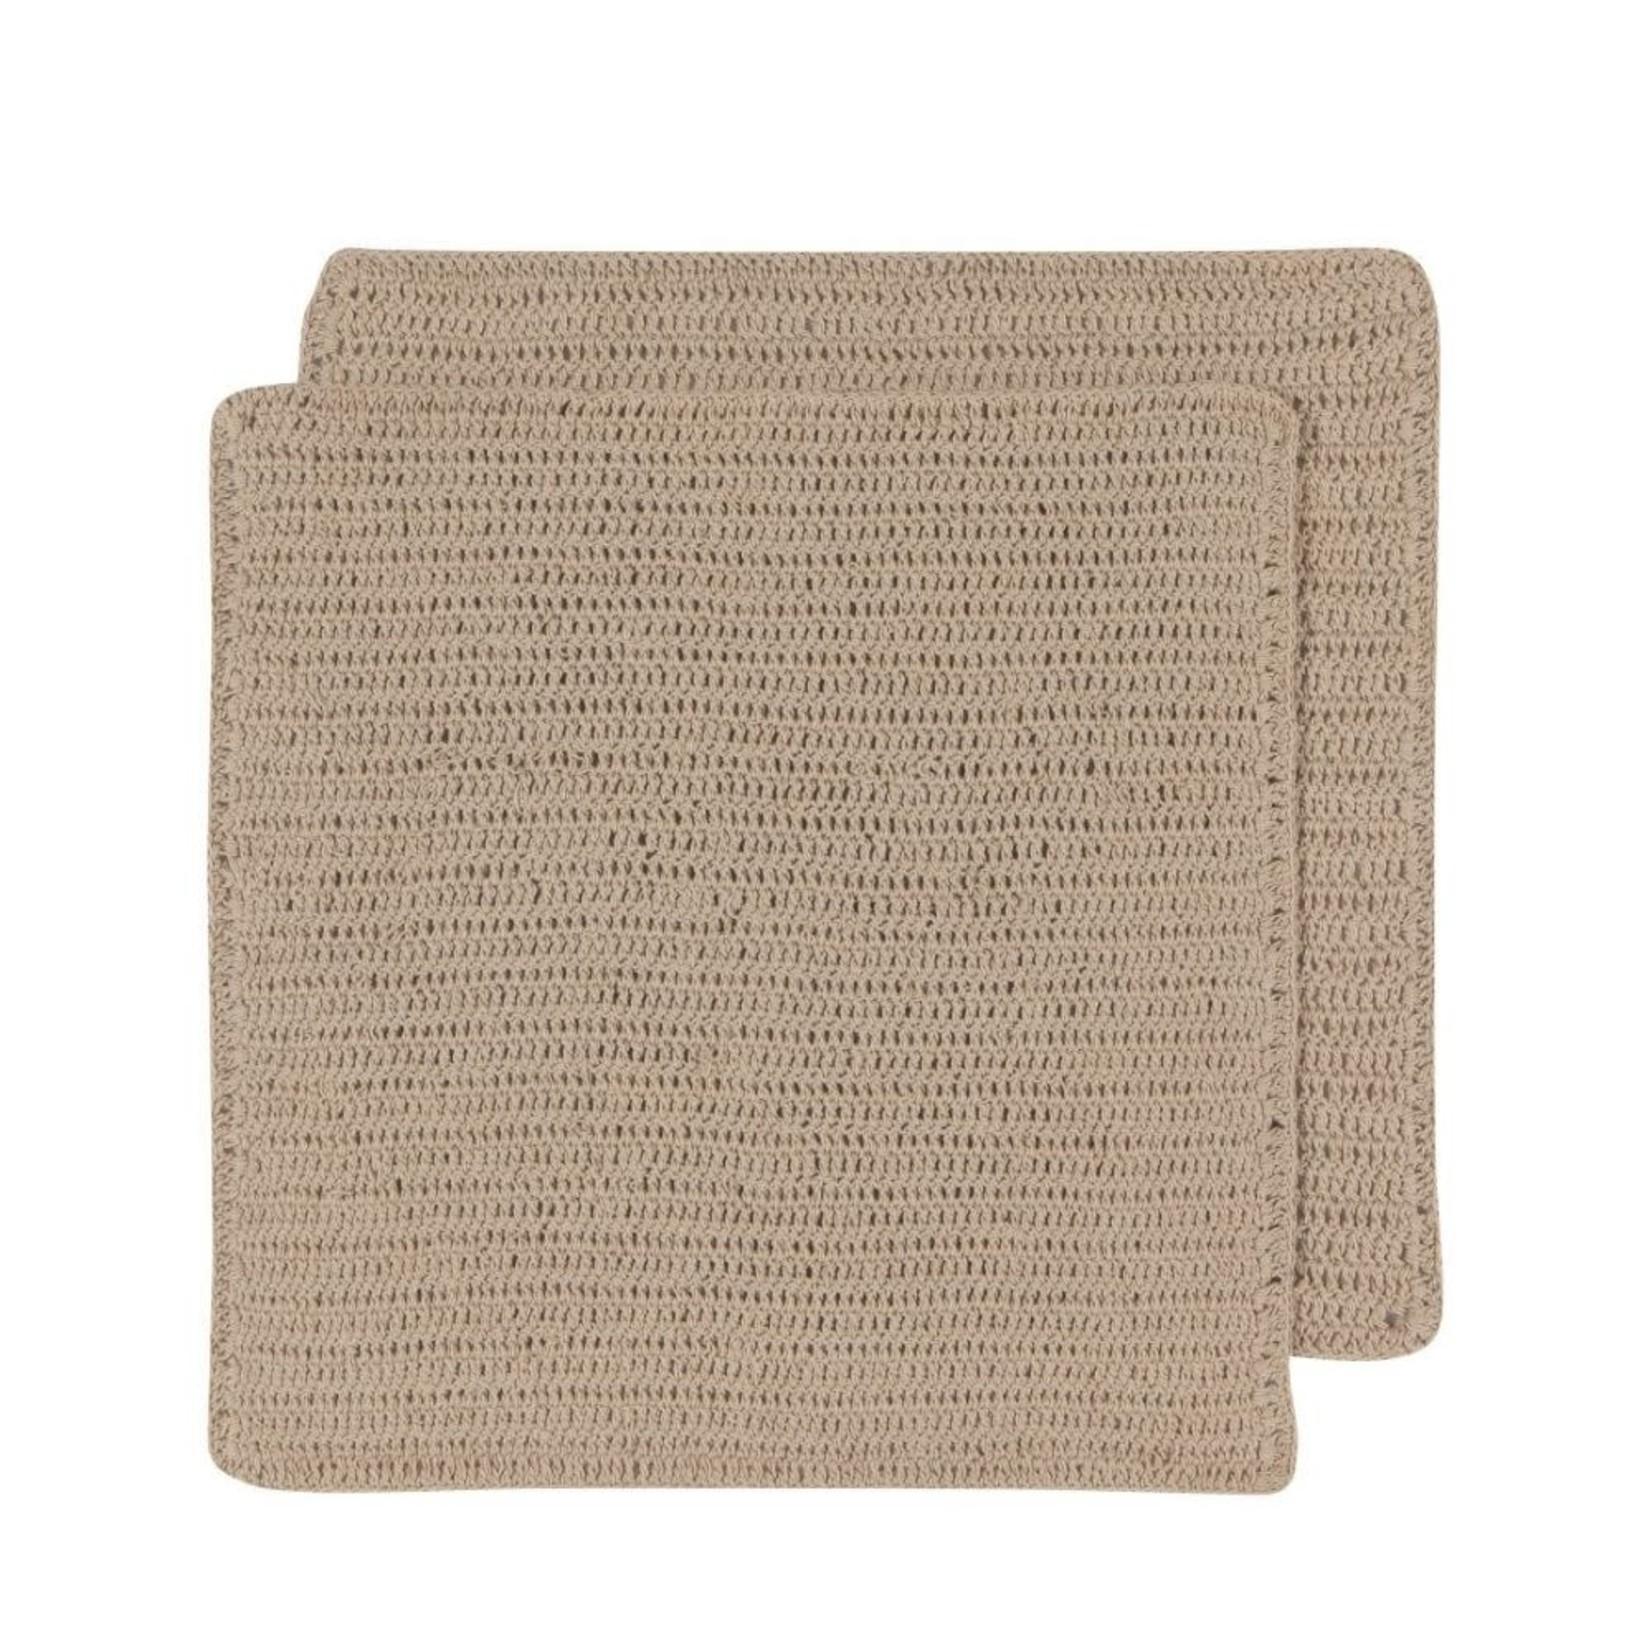 Homespun Dish Cloth Set in Sandstone